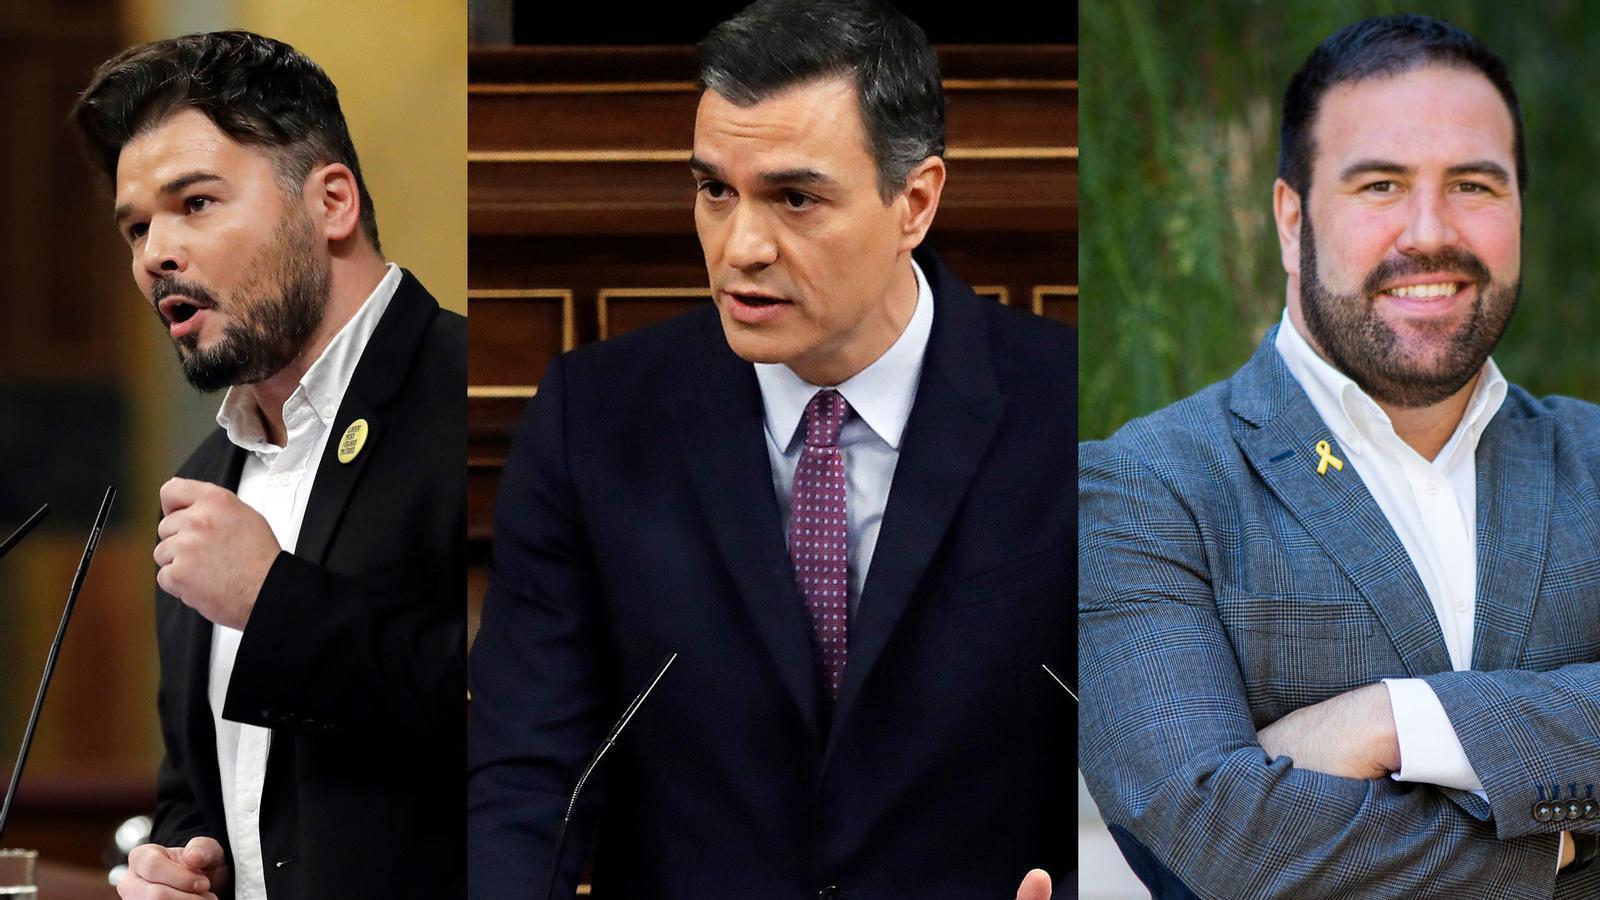 L'anàlisi d'Antoni Bassas: 'Sánchez, president tan legítim com incoherent'